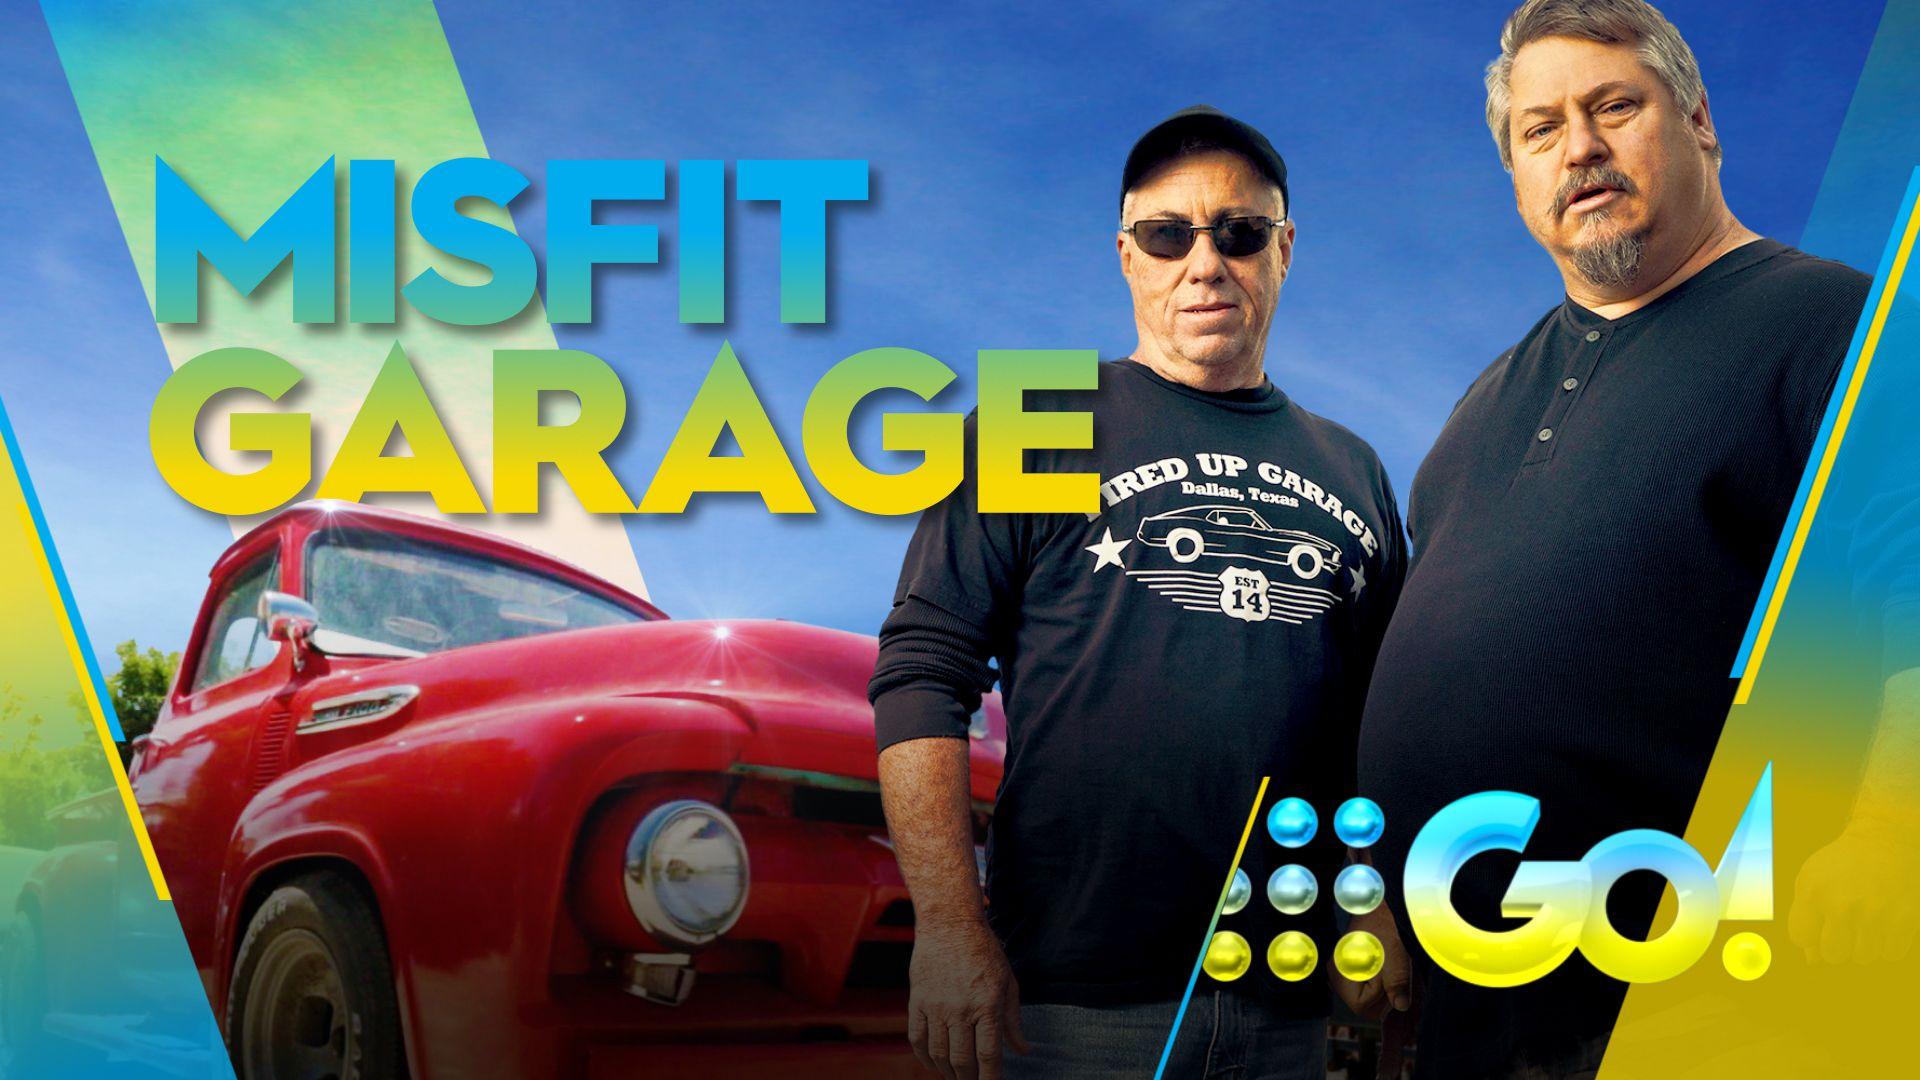 Misfit Garage